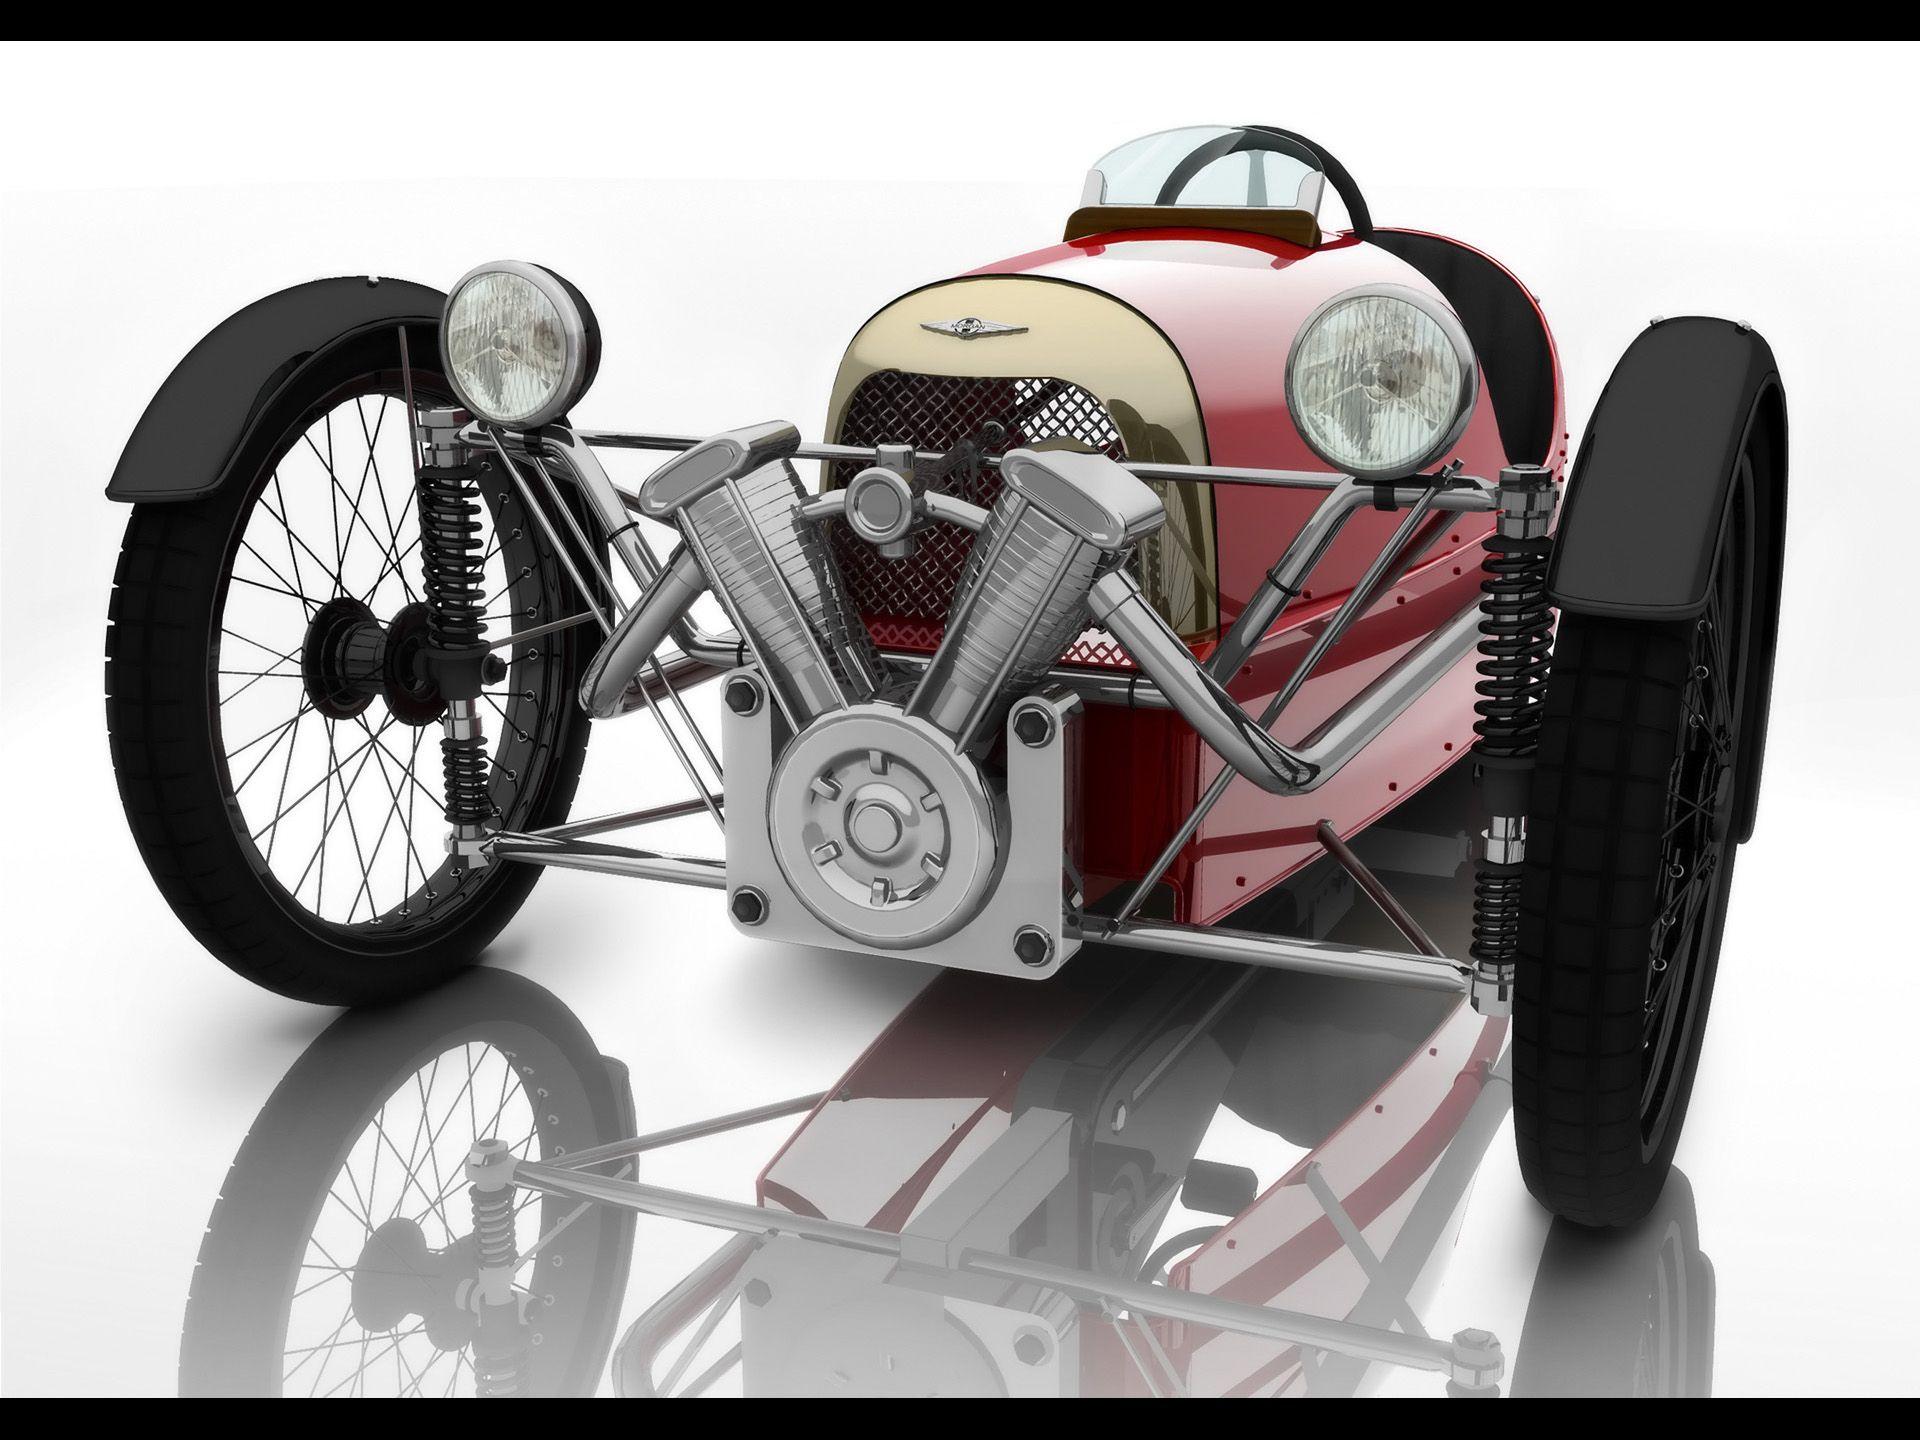 2009 Morgan Supersport Pedal Cars Morgan Motors Vintage Pedal Cars